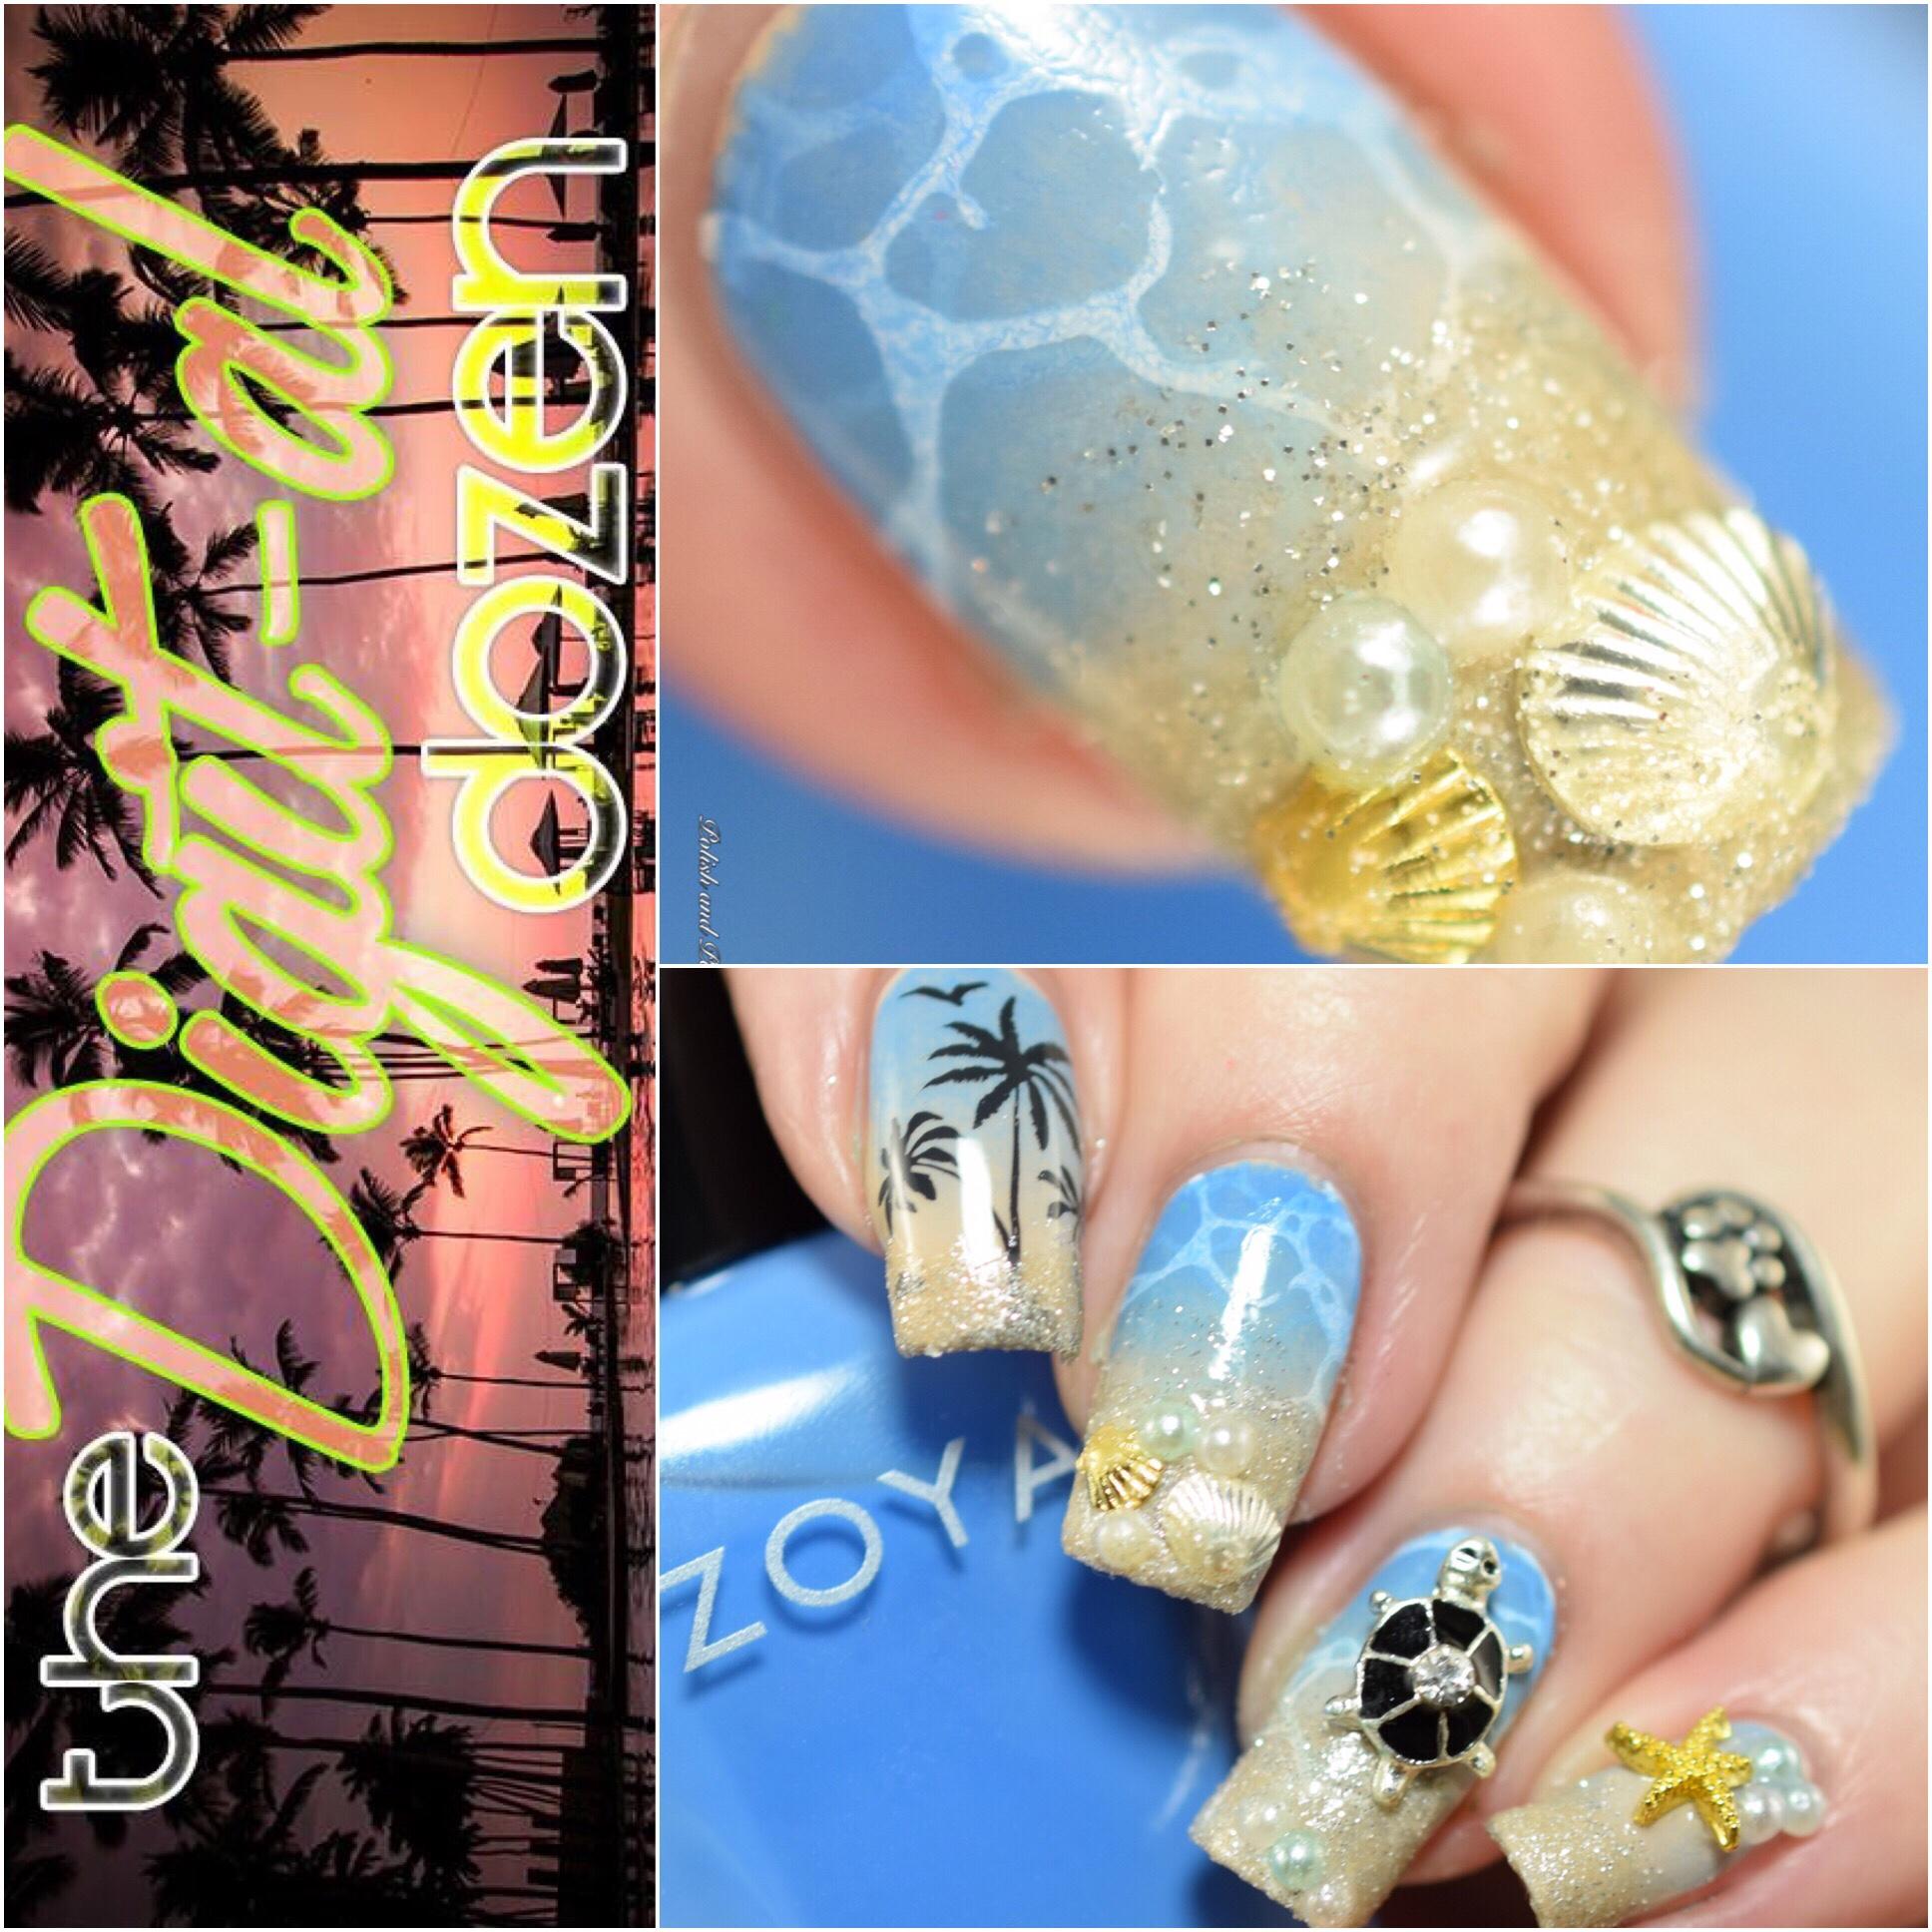 Polish and Paws Tropical Beach Nails